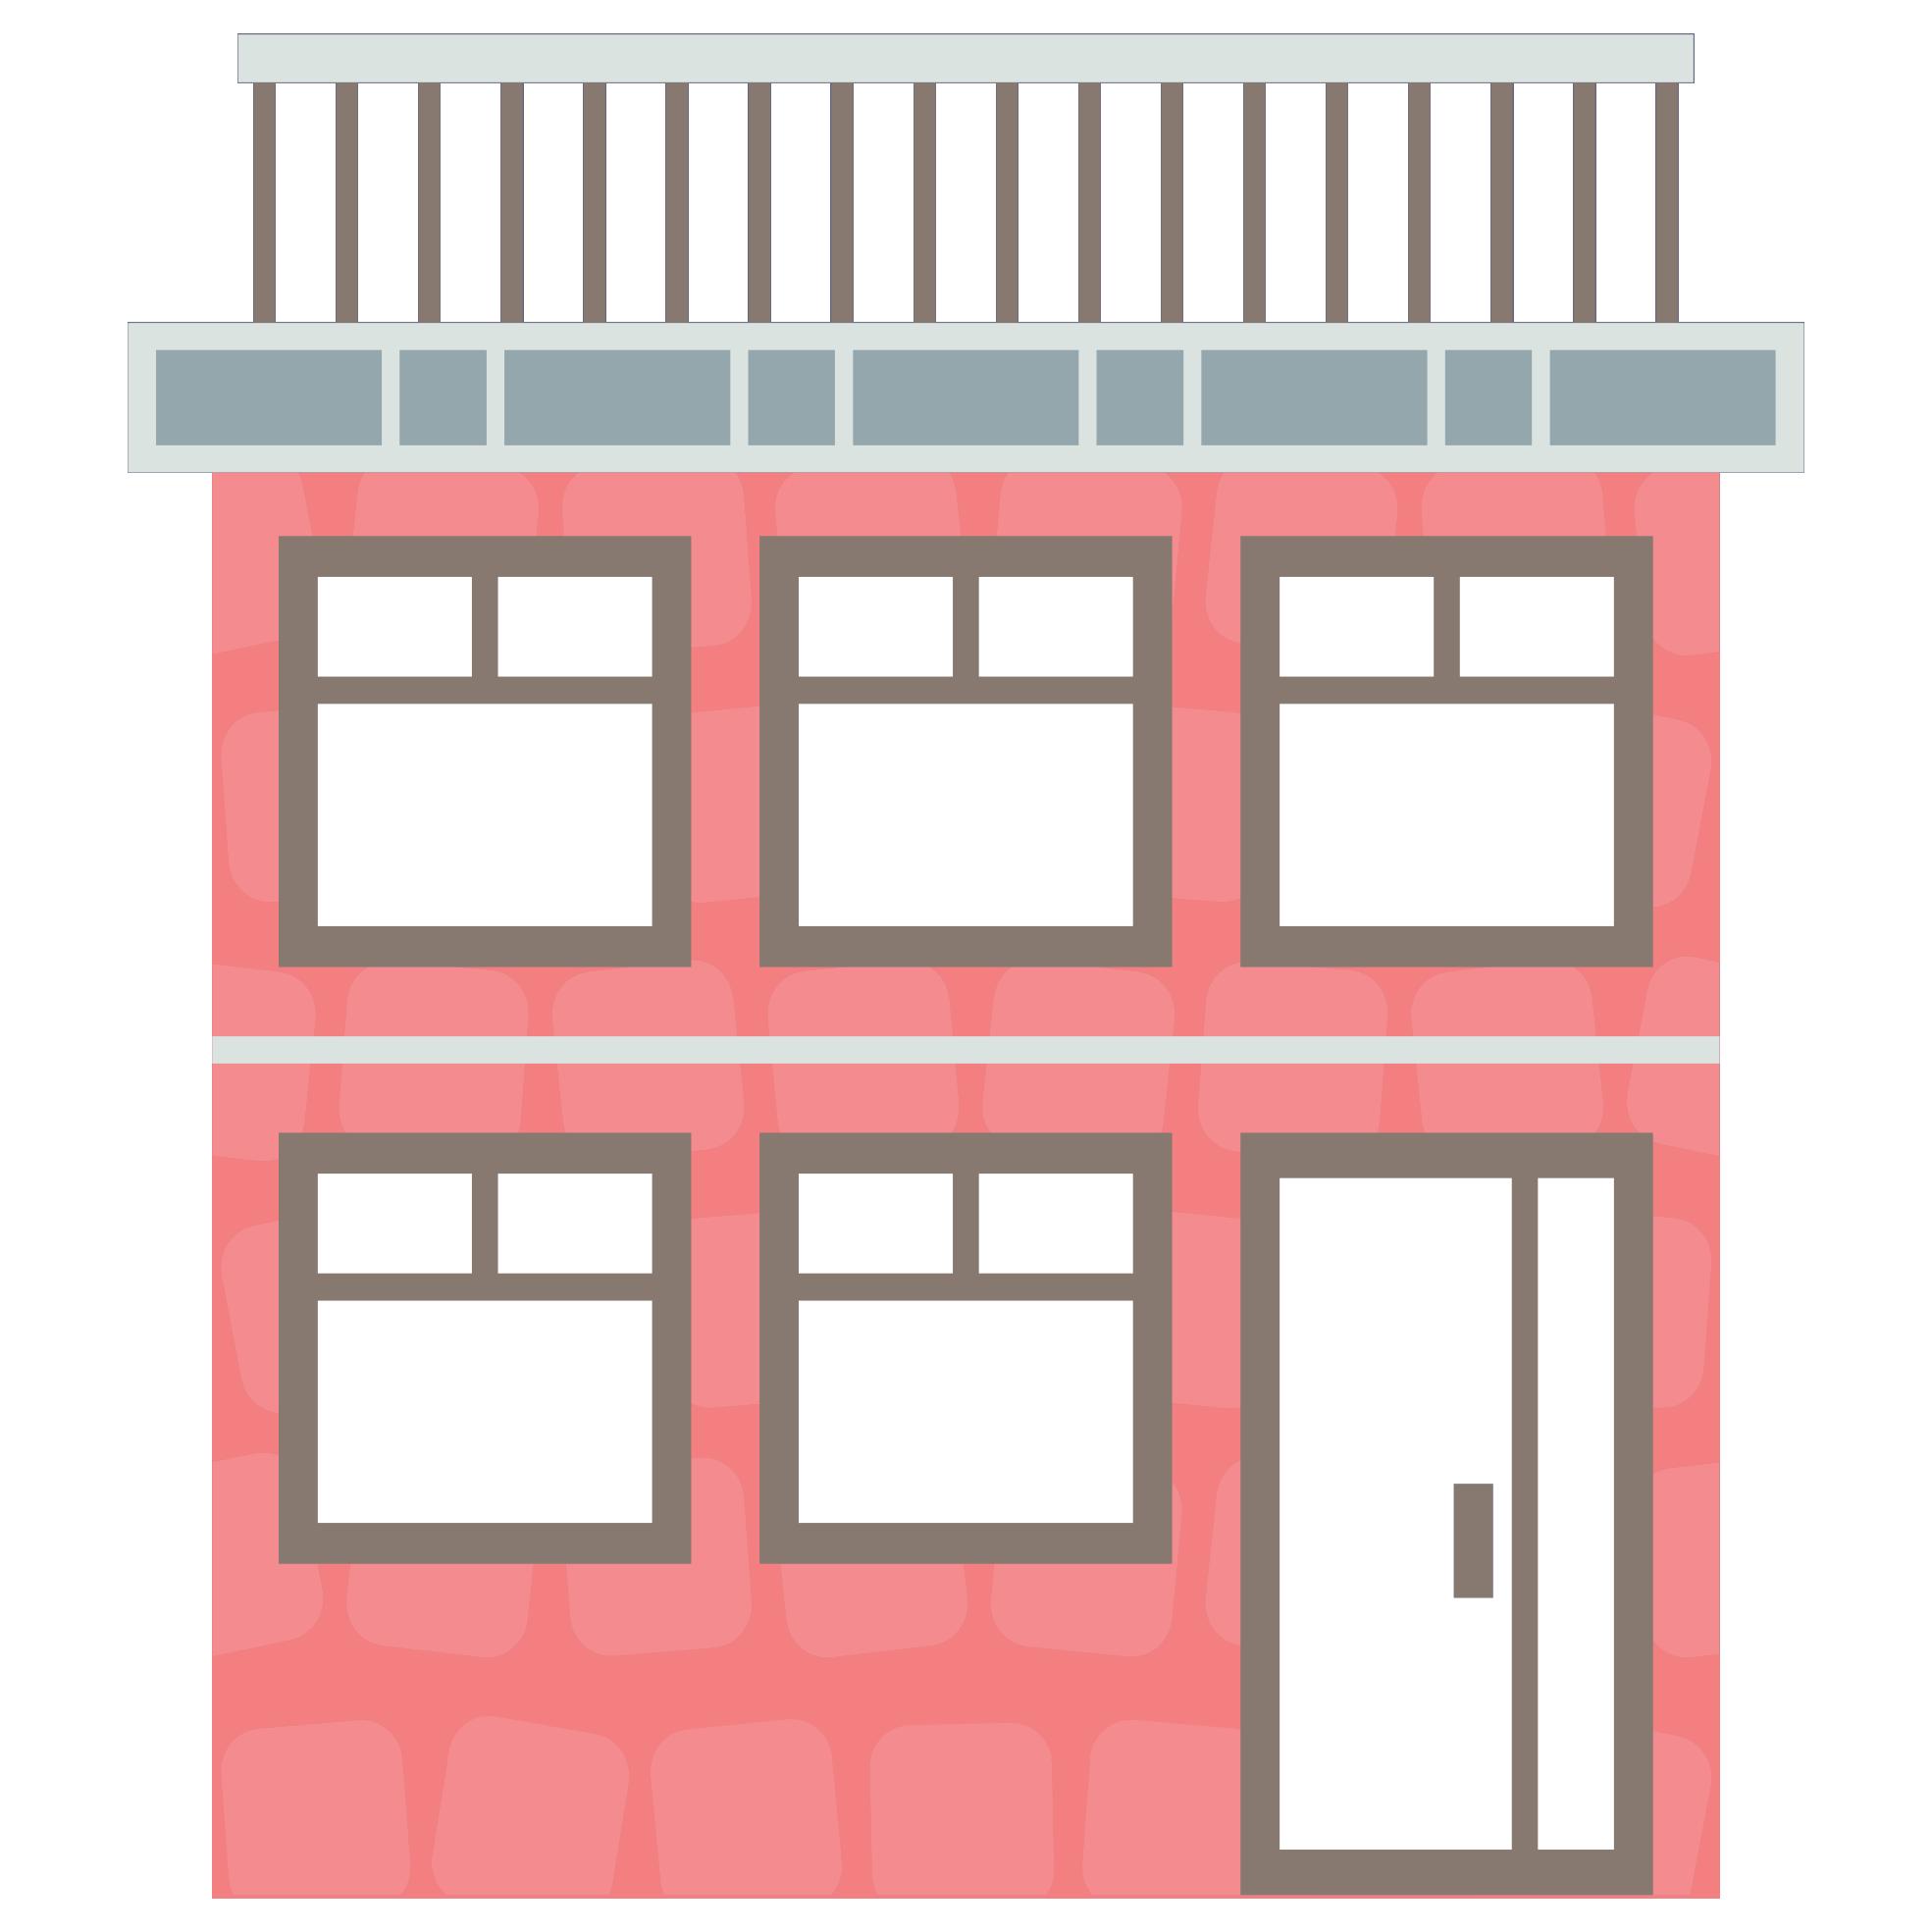 Download Shop Building Png Hq Png Image Freepngimg